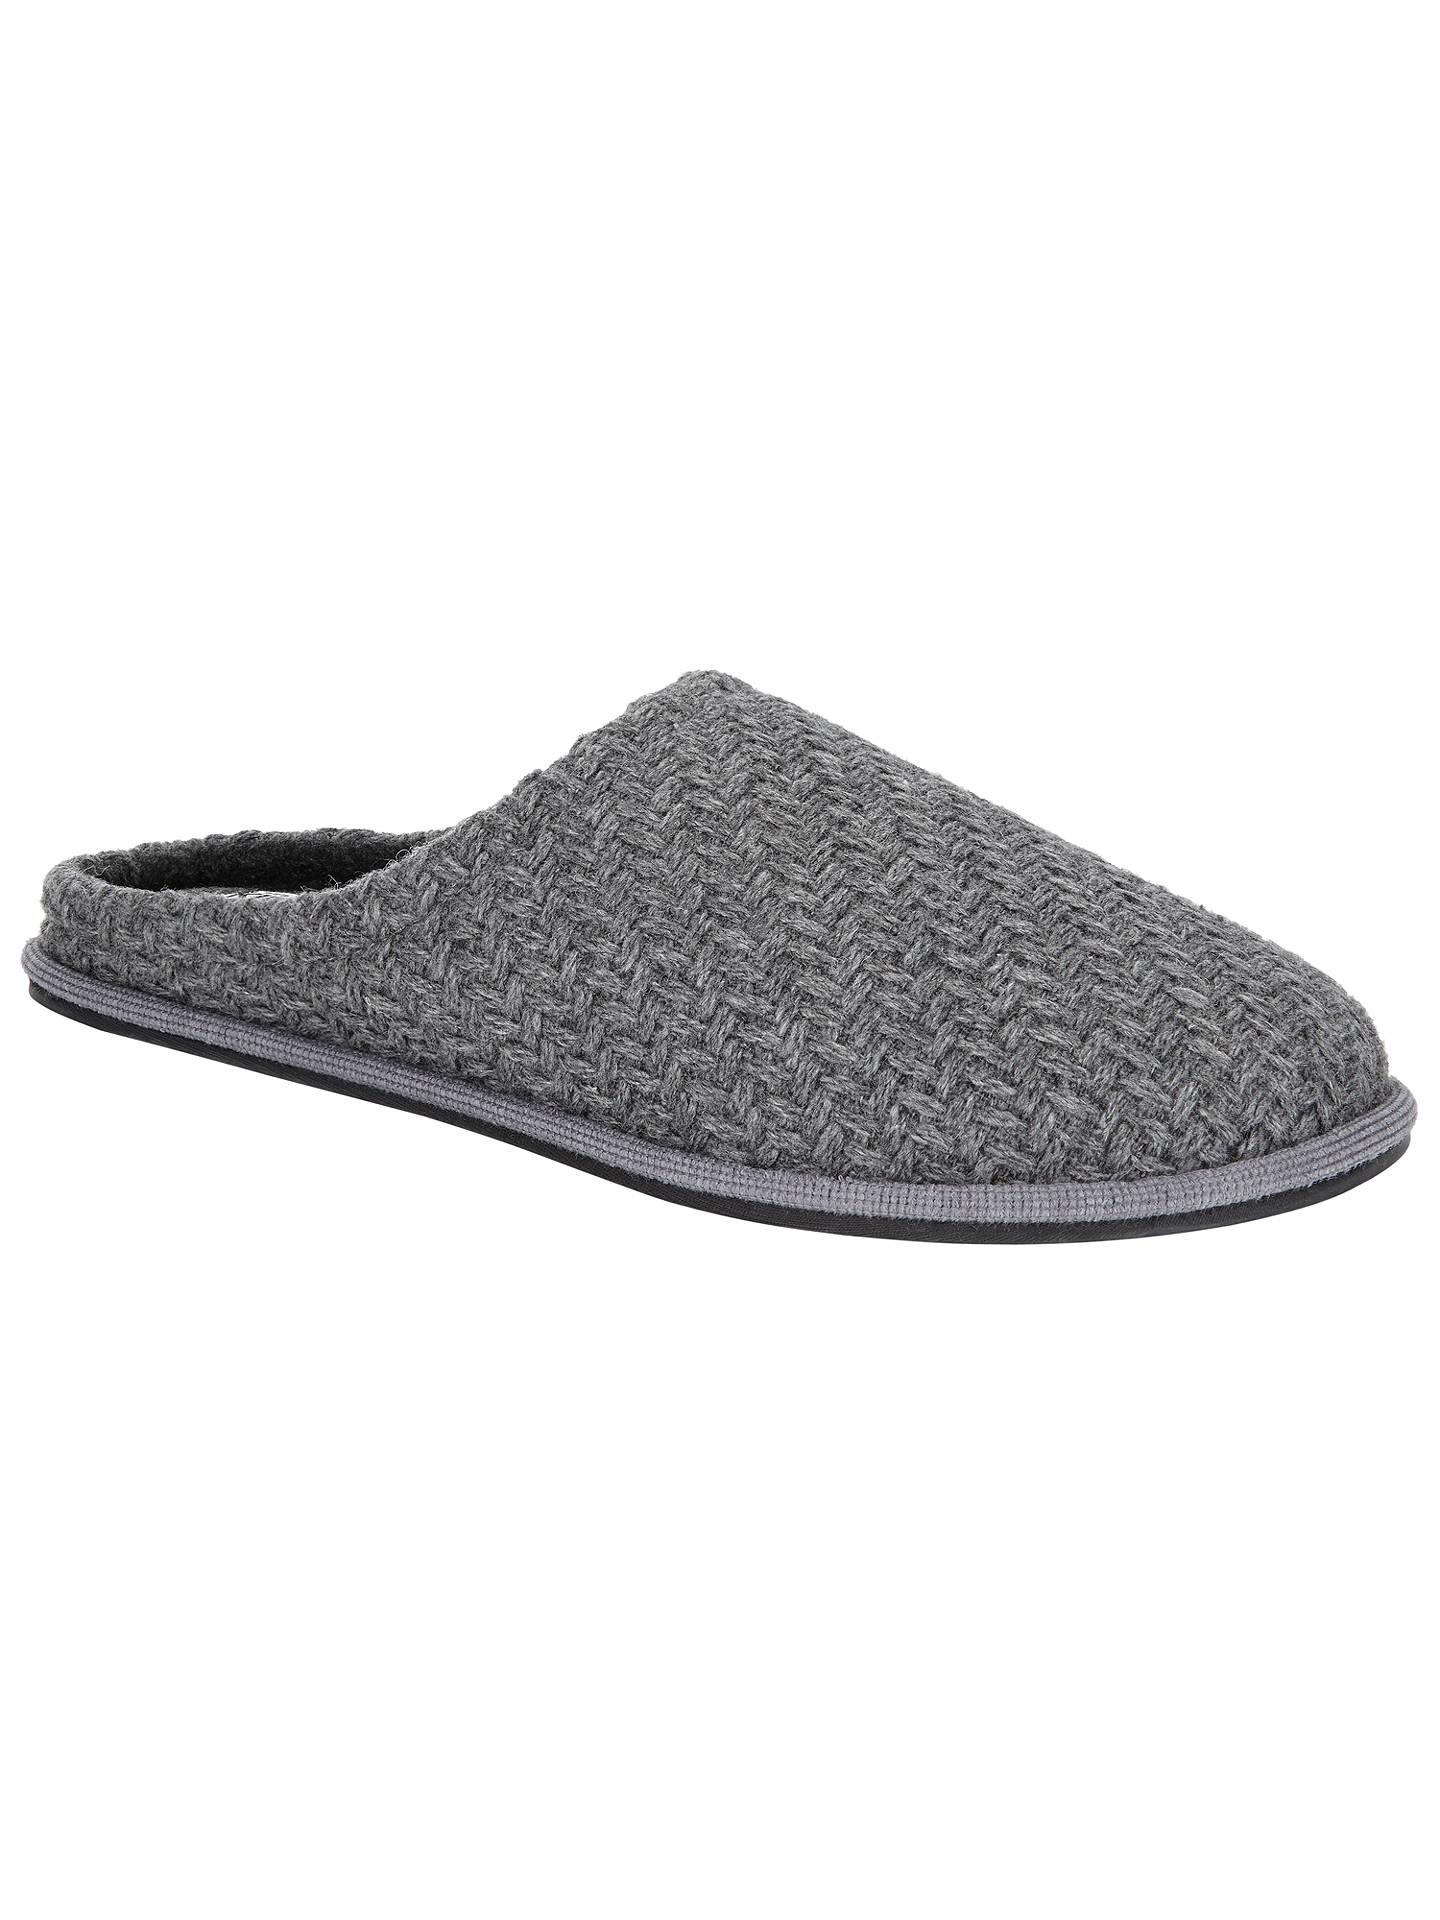 Kin Basket Weave Slippers at John Lewis   Partners 41d0ae551